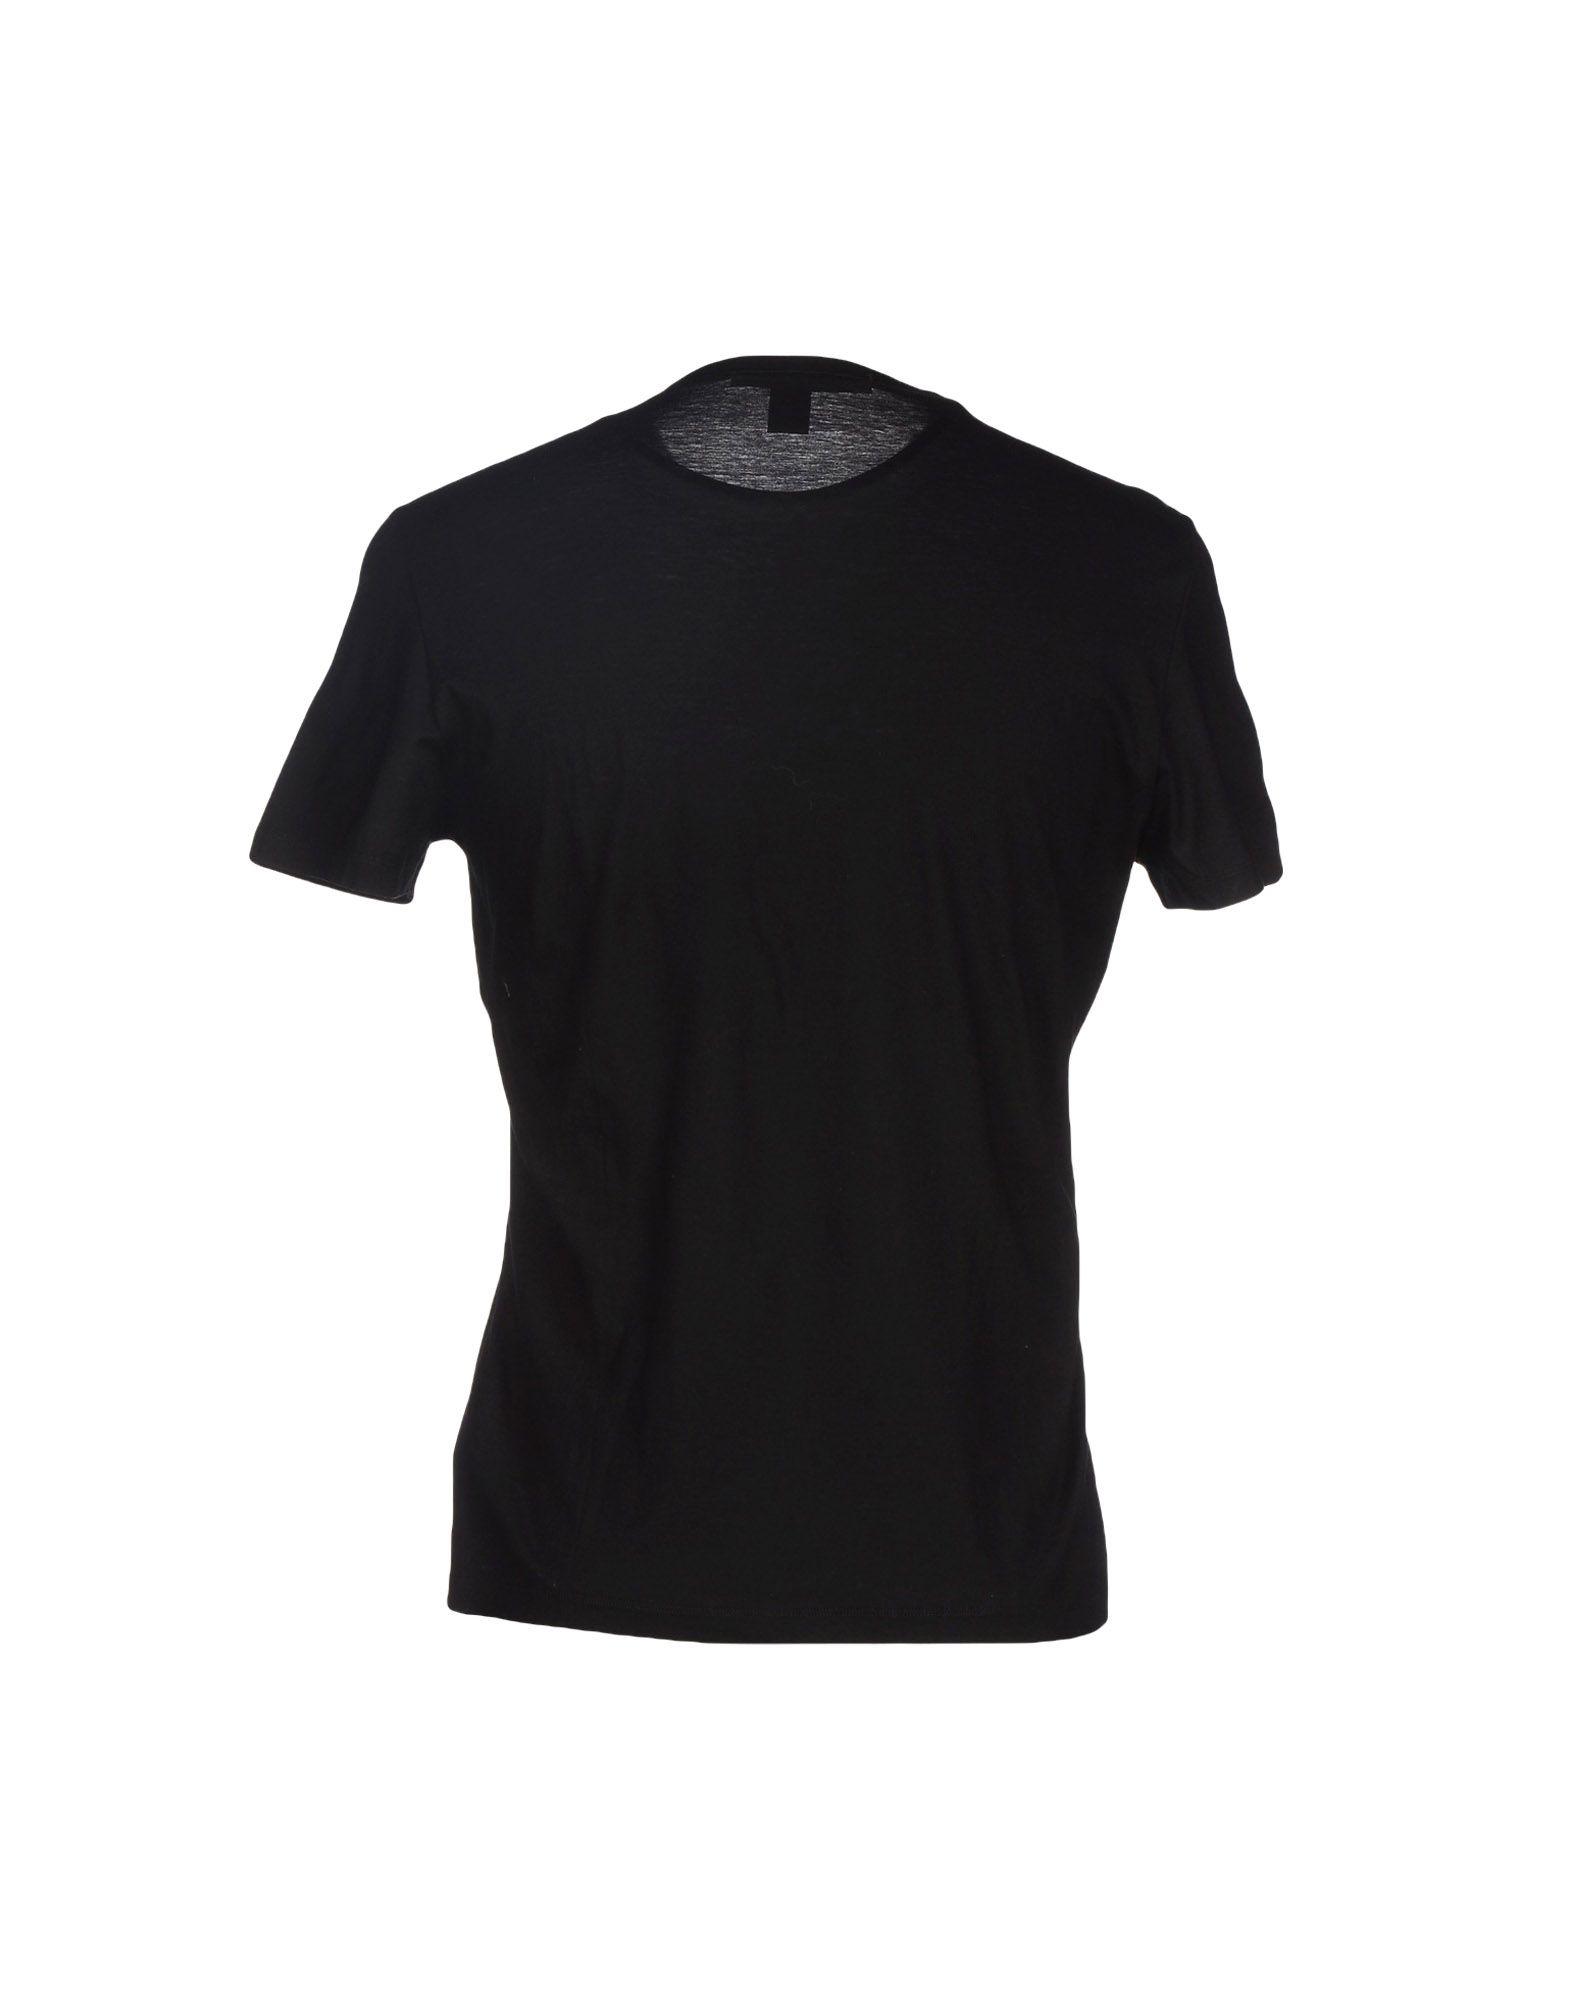 Eagles Black Jersey Green Pants >> Lyst - Class Roberto Cavalli T-shirt in Black for Men